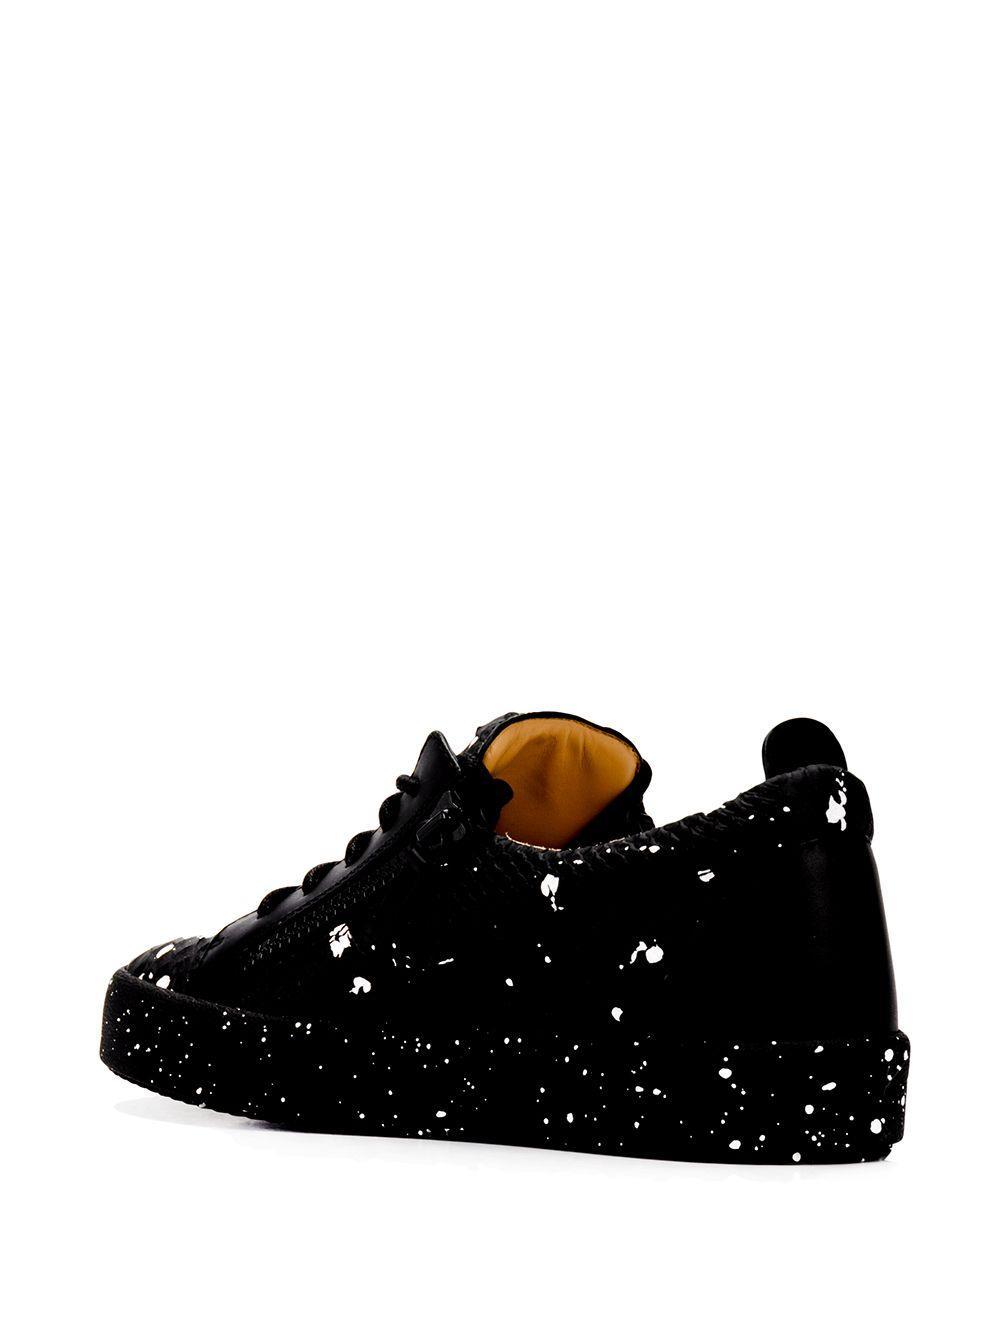 Zapatillas Gail con efecto de piel de pitón Giuseppe Zanotti de Cuero de color Negro para hombre